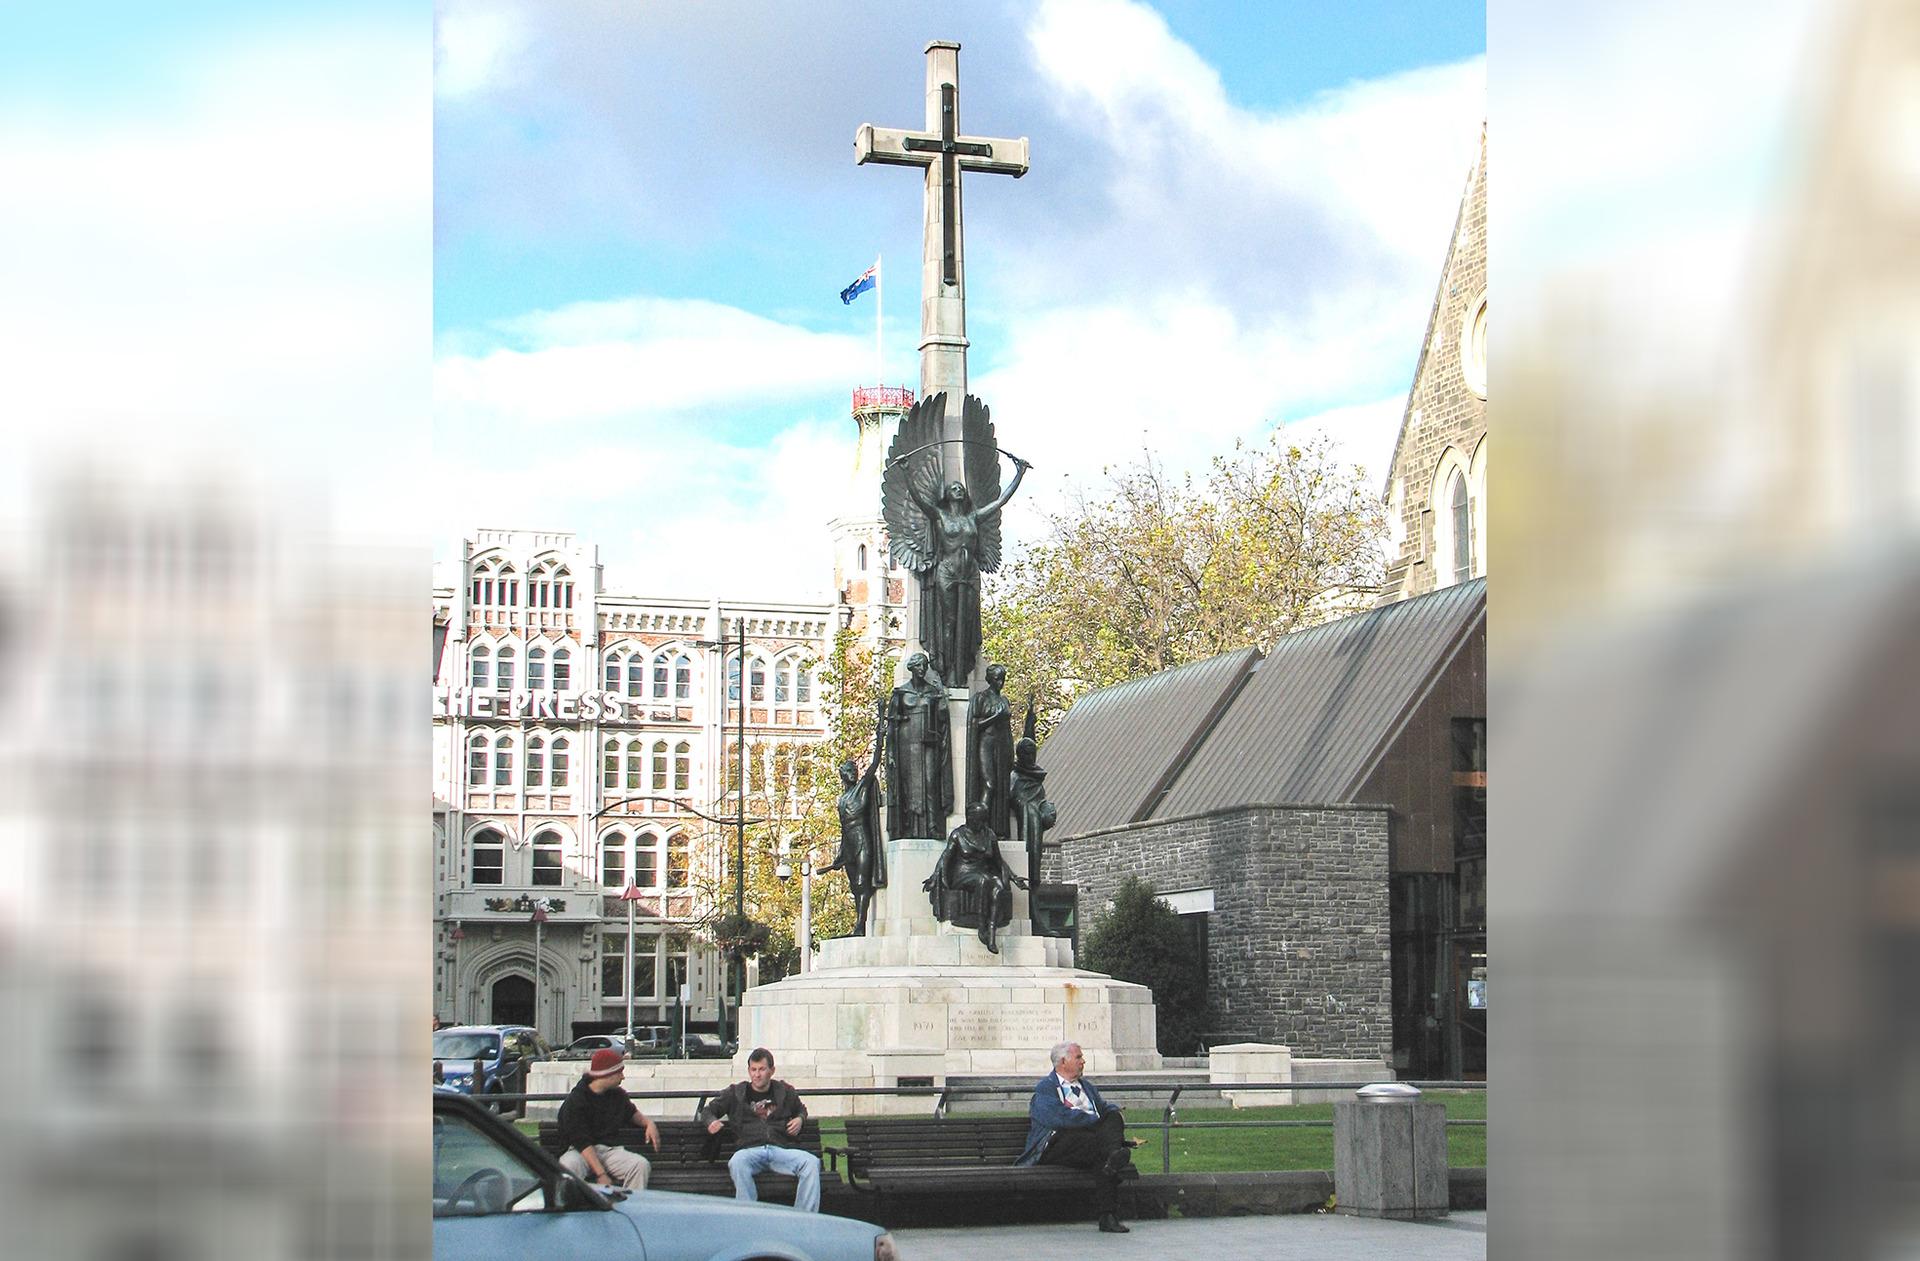 Christchurch RSA applies to move historic city centre cenotaph off-limits since 2011 quake